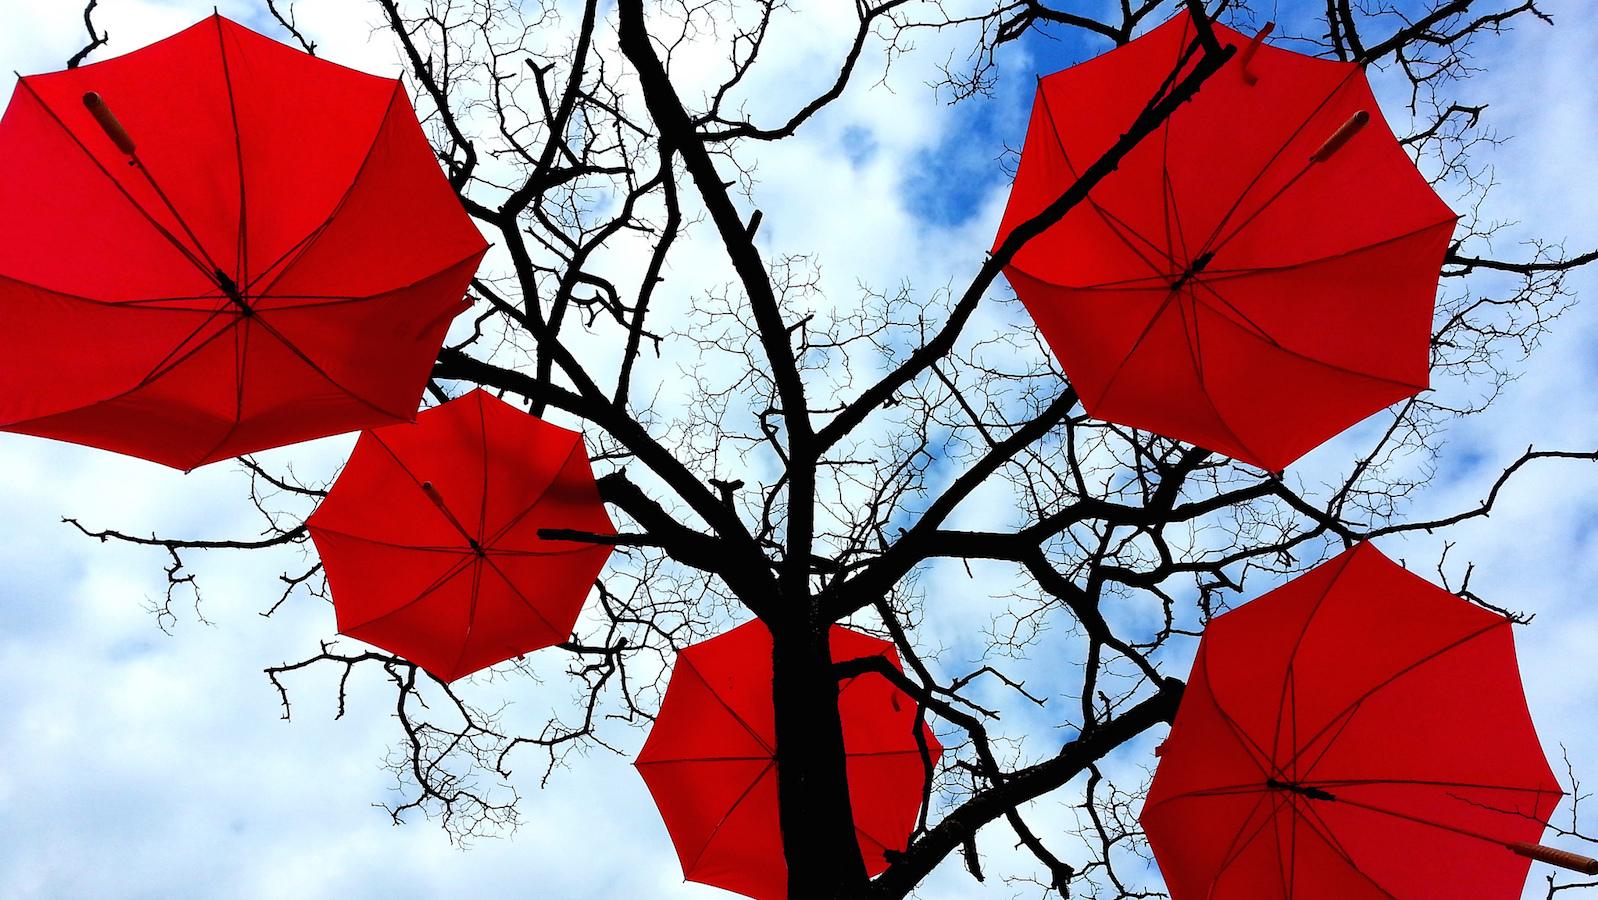 umbrellatrees